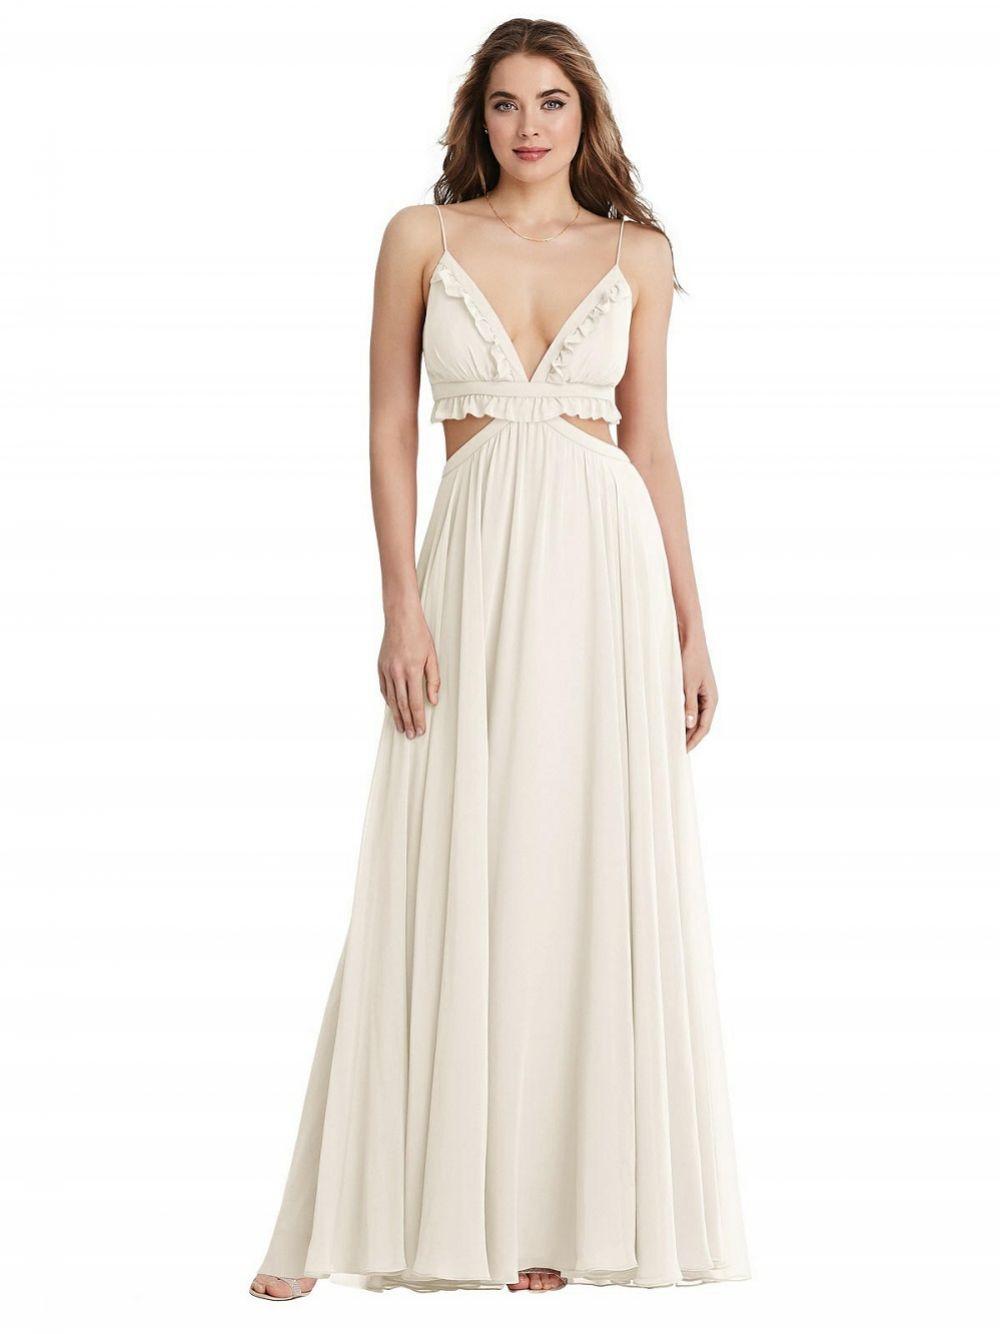 Jessie Ruffled Chiffon Cut-out Boho Maxi Wedding Dress